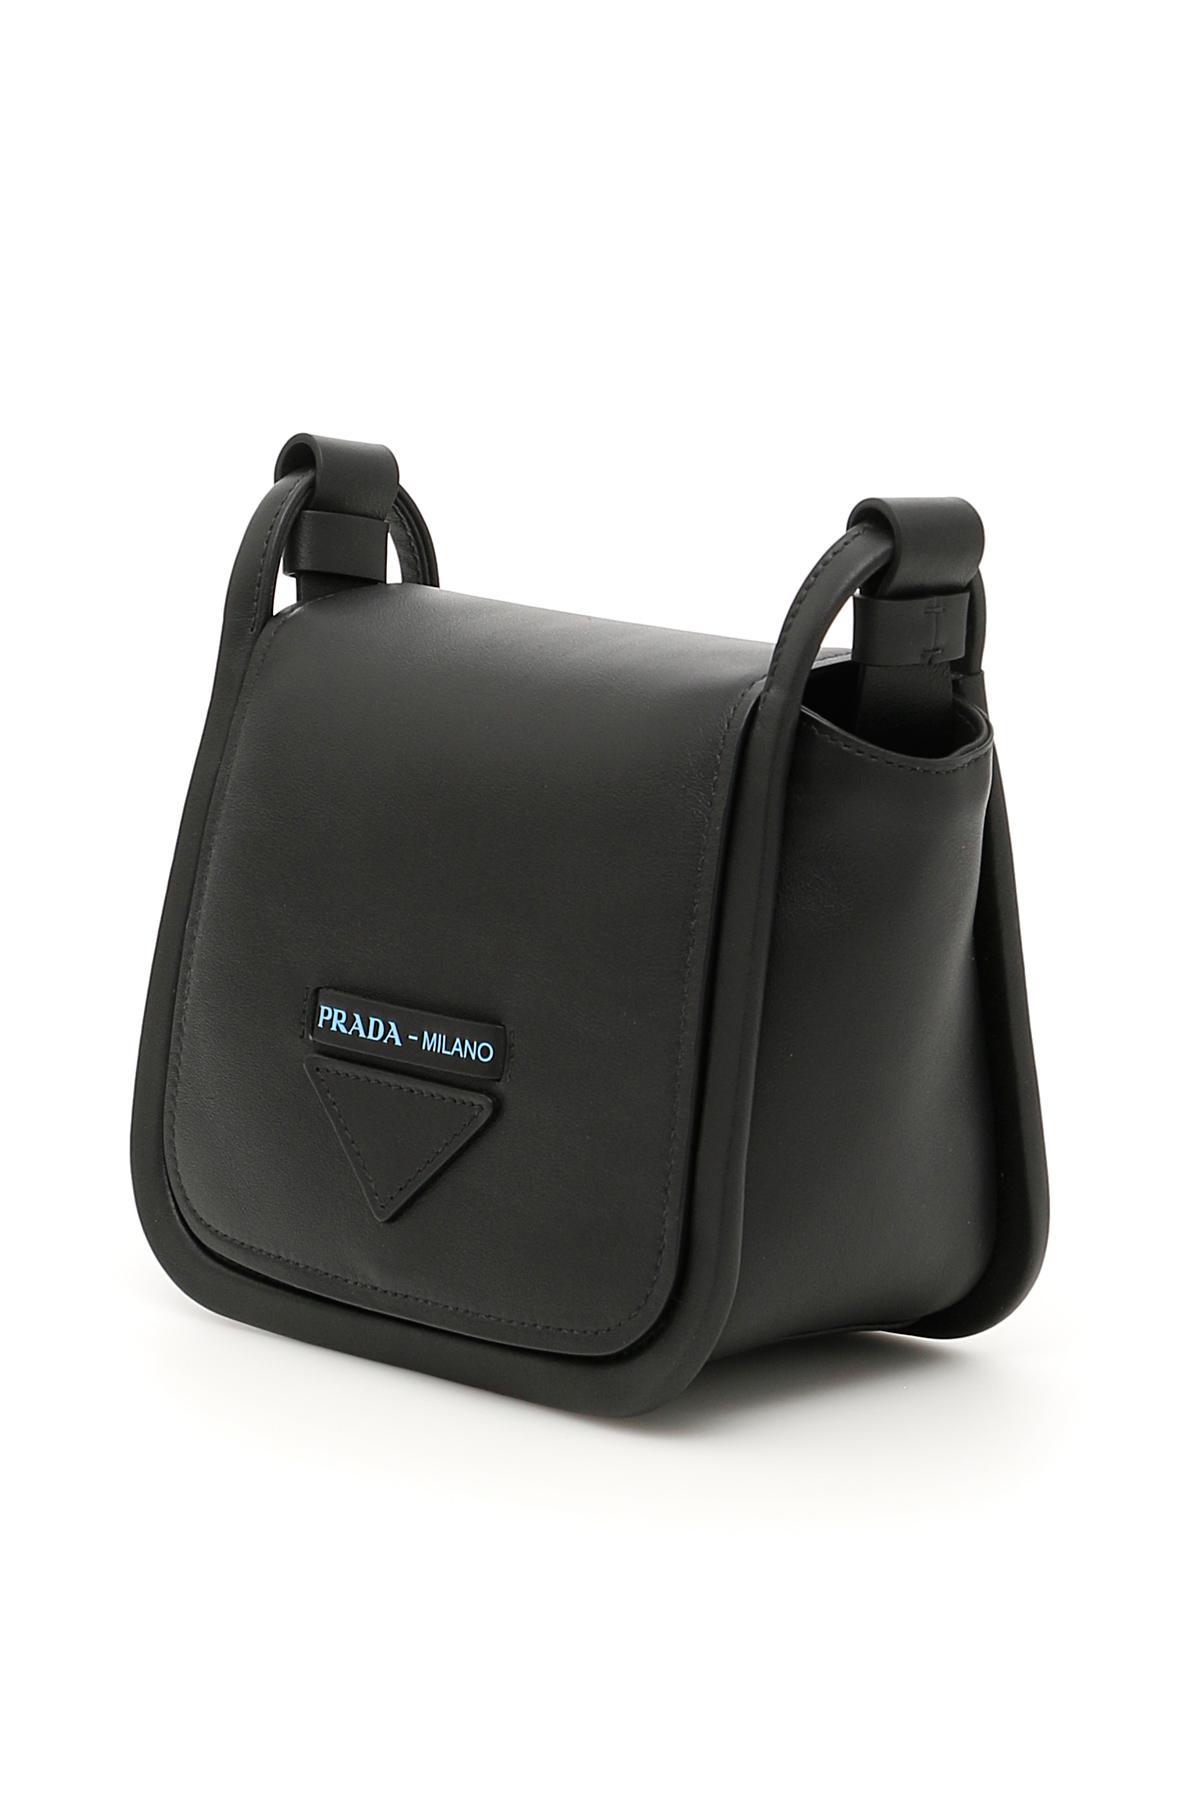 998d954e9fc8 Lyst - Prada Concept Bag in Black